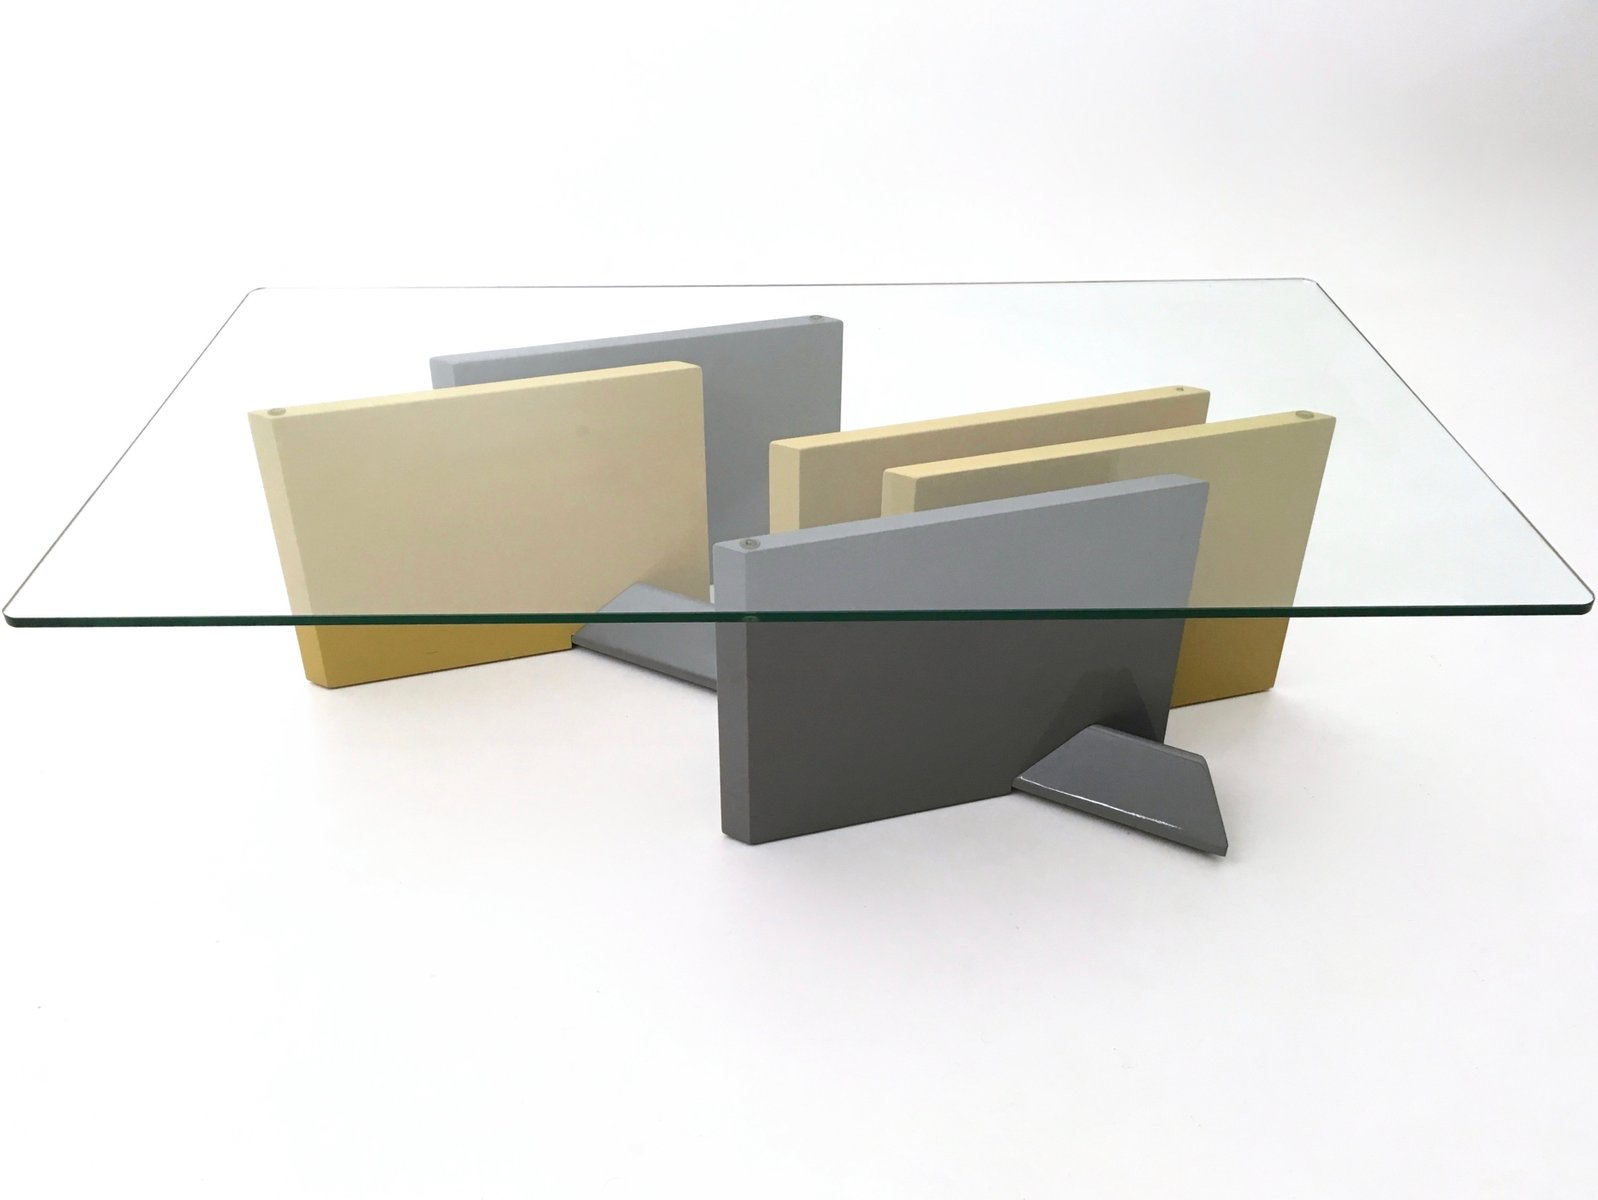 couchtisch aus lackiertem holz kristallglas 1980er bei. Black Bedroom Furniture Sets. Home Design Ideas